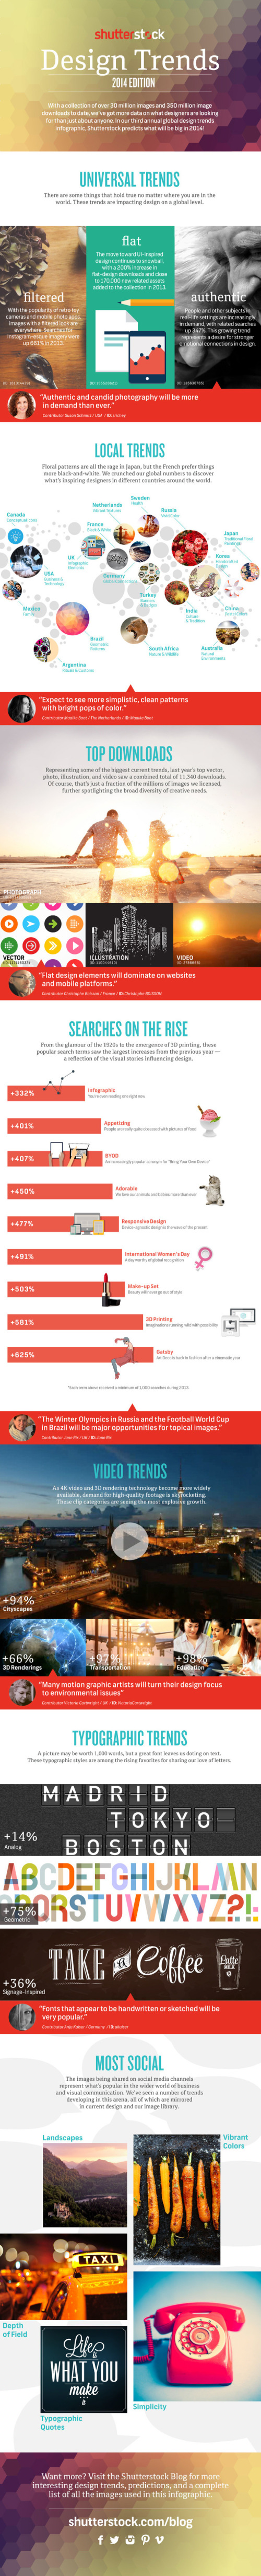 Shutterstock's Global Design Trends 2014 infographic